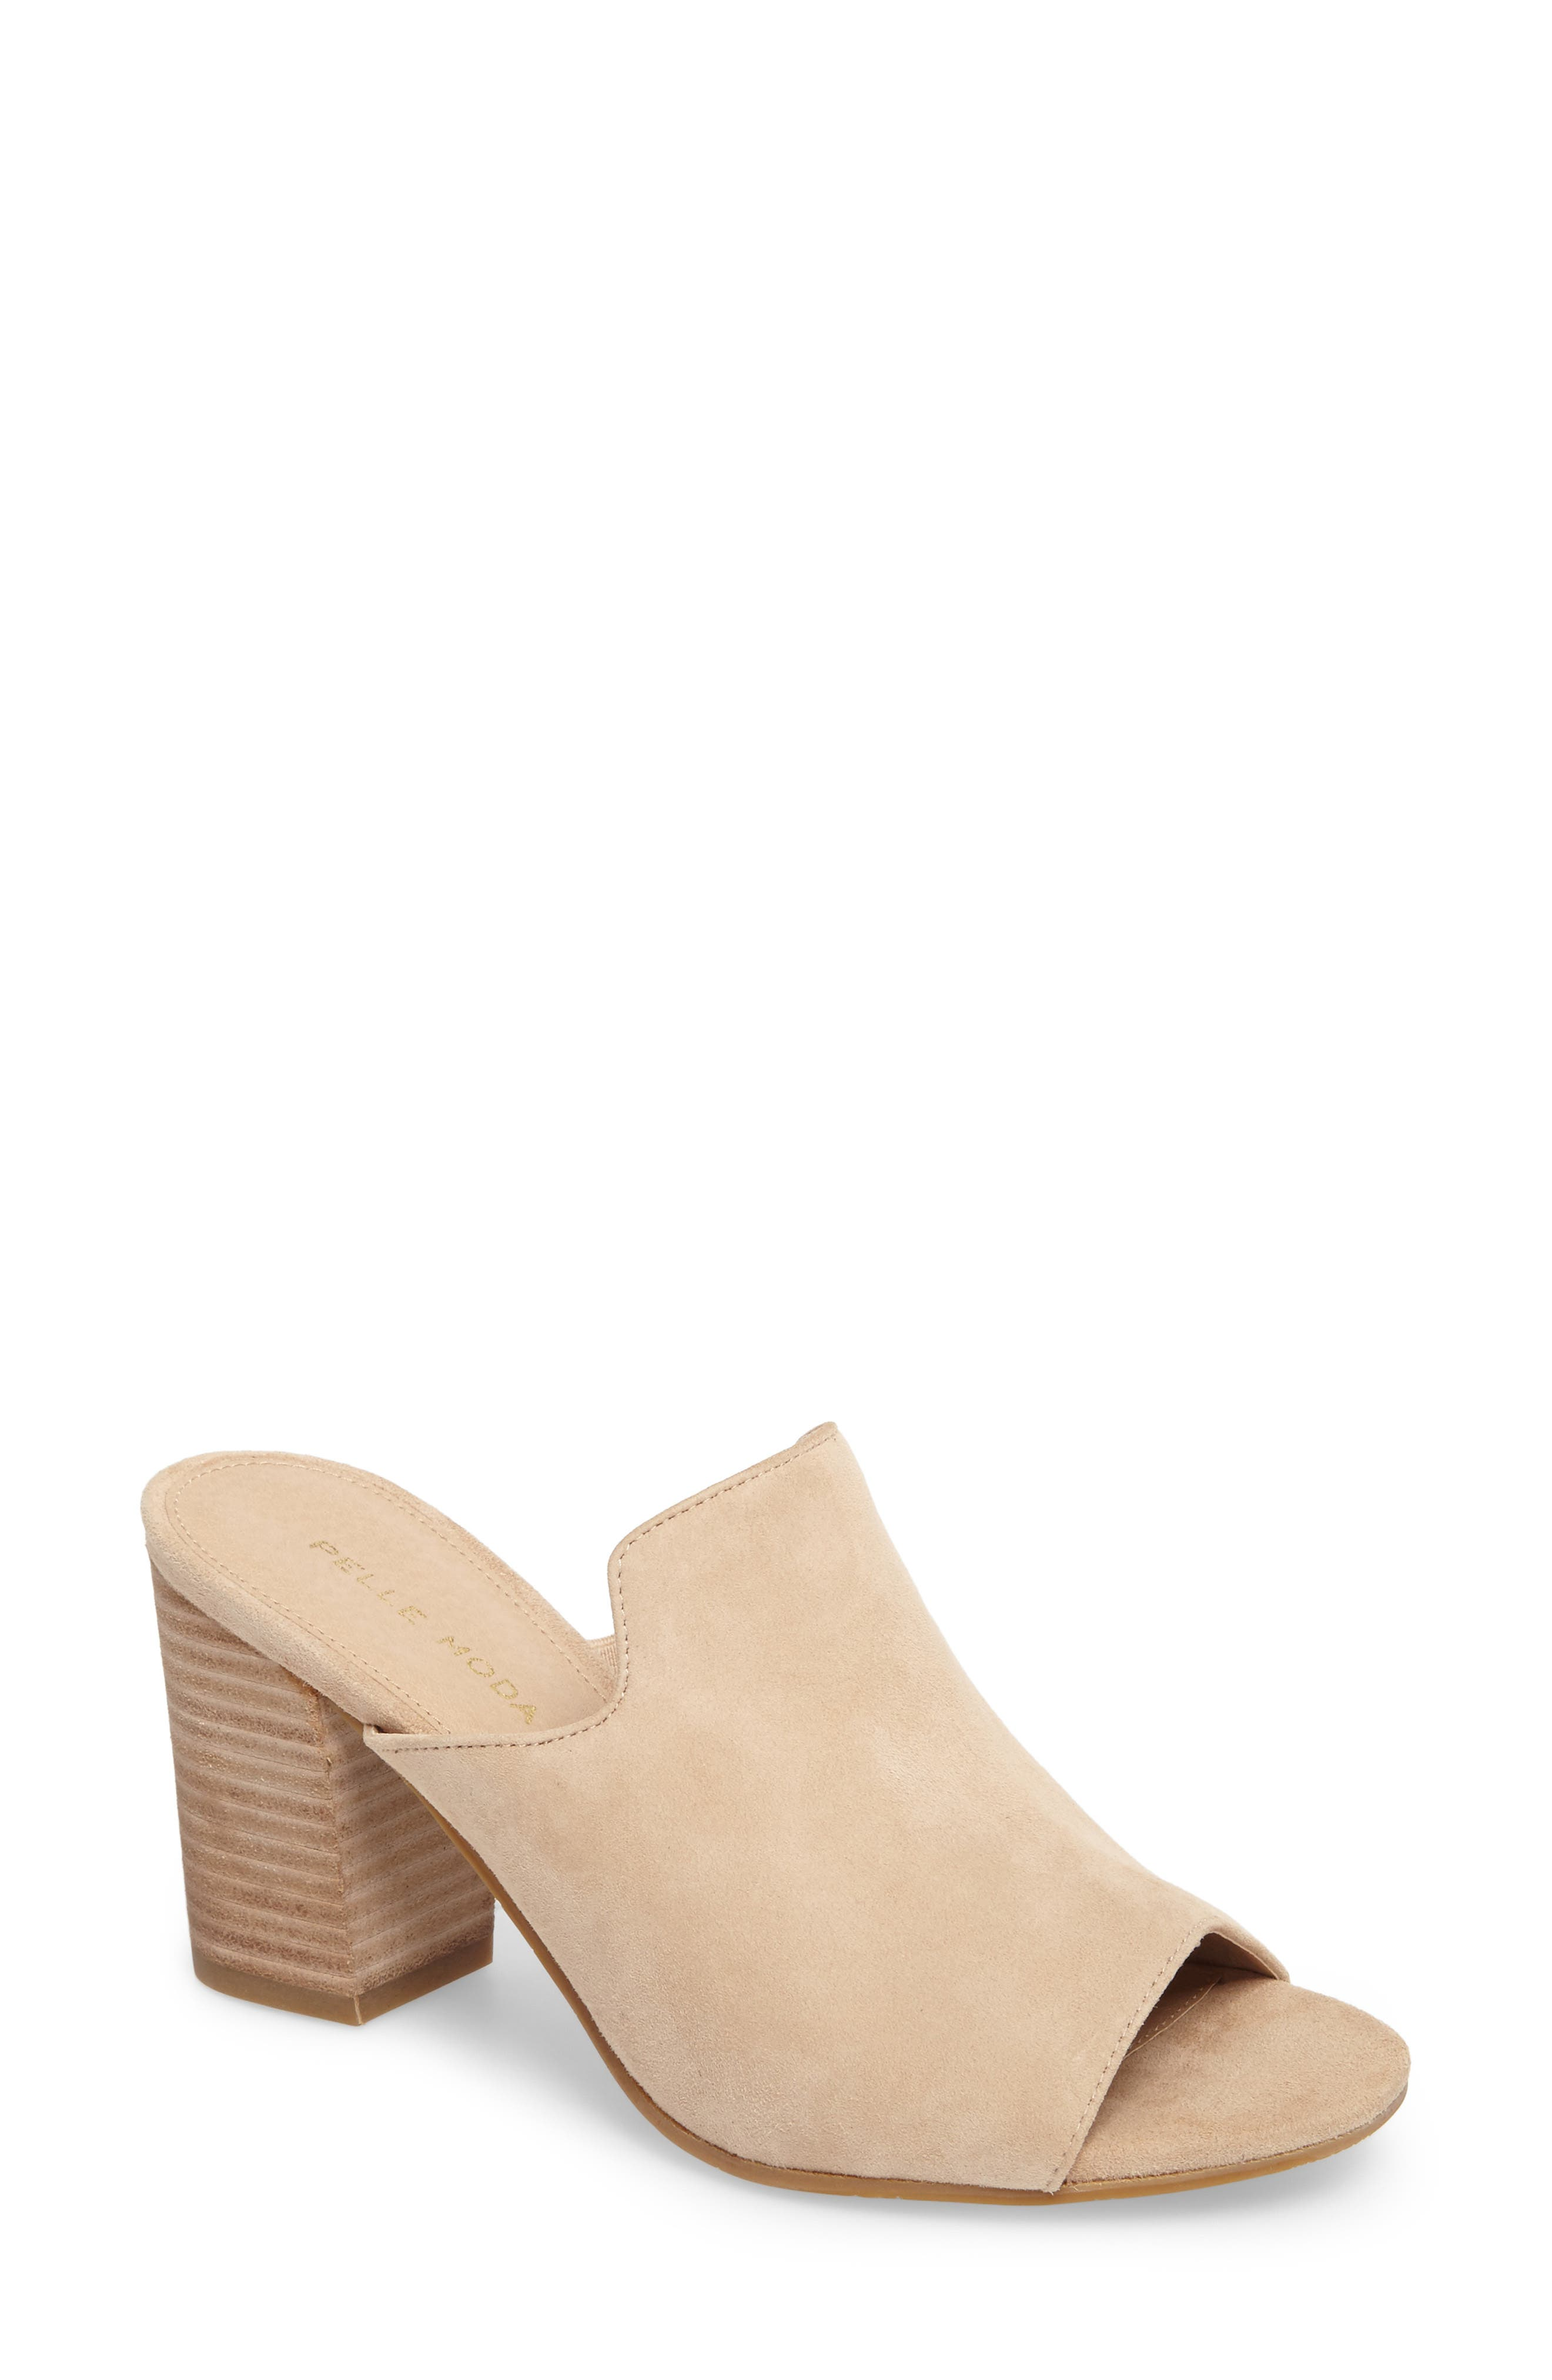 Alternate Image 1 Selected - Pelle Moda Blair Peep Toe Mule (Women)